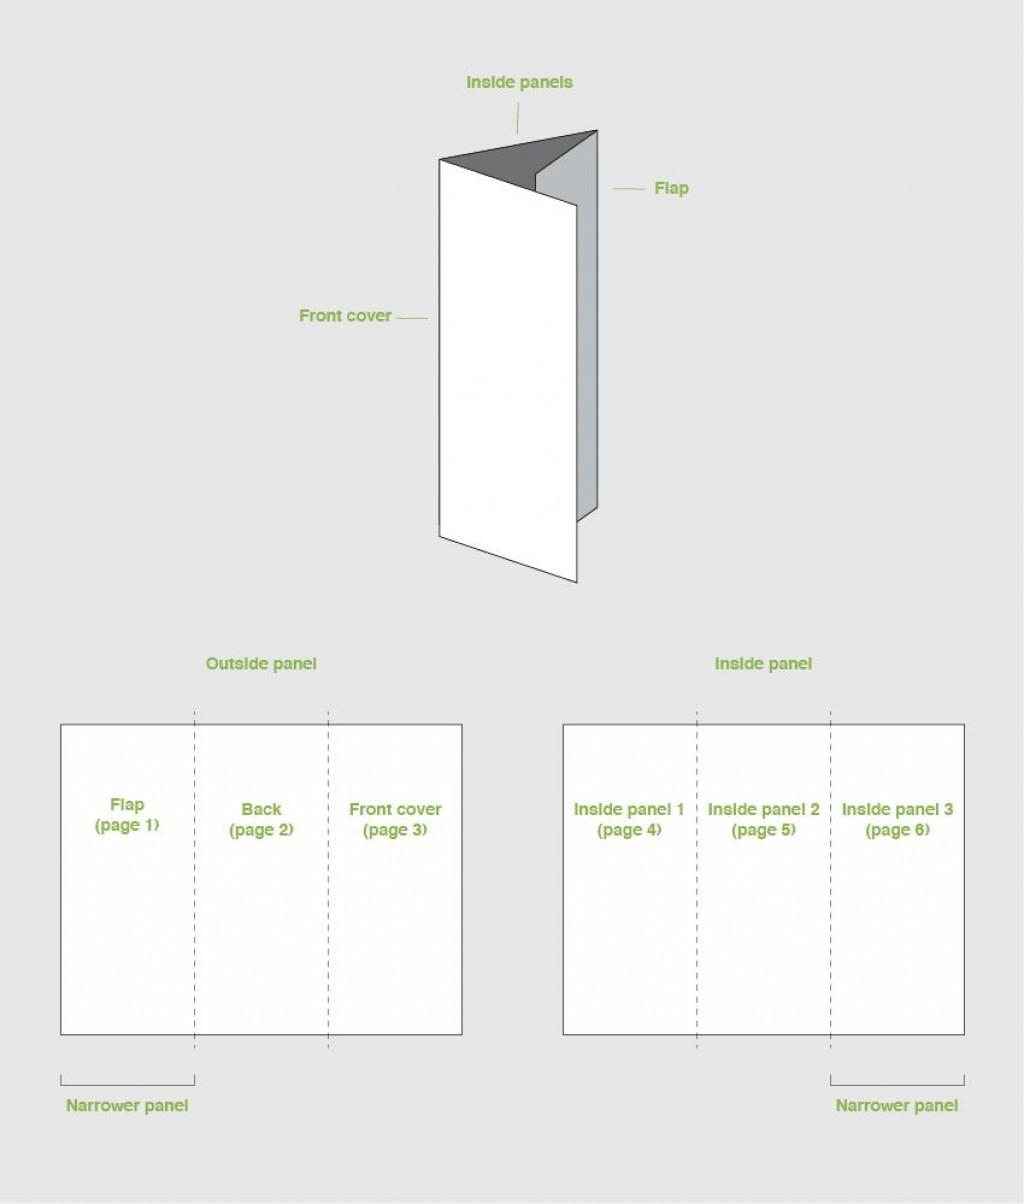 000 Fascinating Three Fold Brochure Template Indesign Idea  3 A4Large